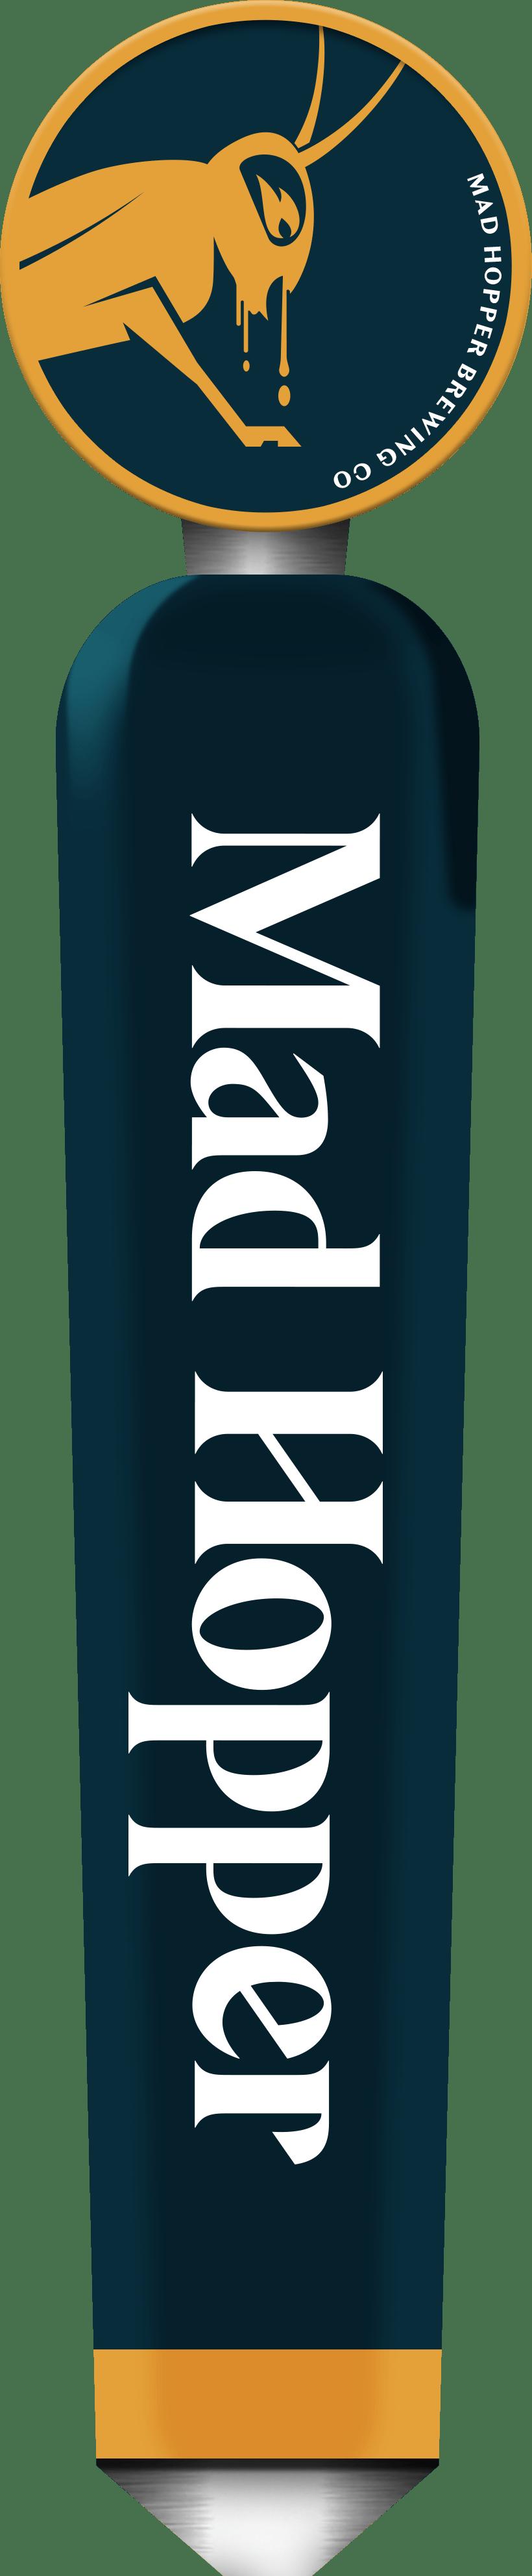 First Night Kveik Pale Ale beer tap label, Mad Hopper Brewing Co., Helsinki, Finland